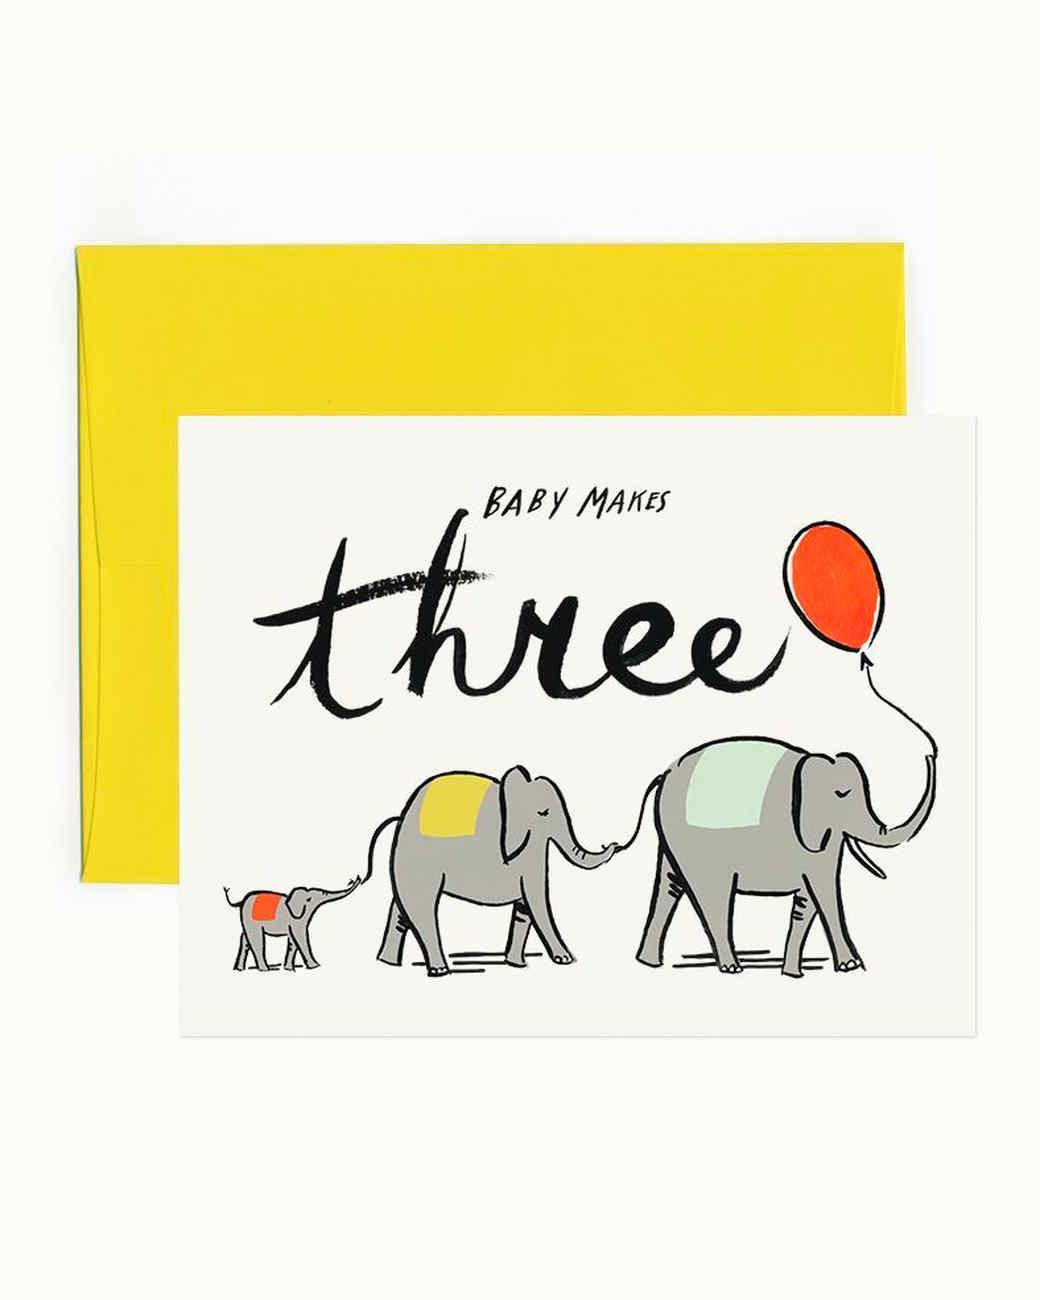 idlewild-baby-congratulations-card-0714.jpg